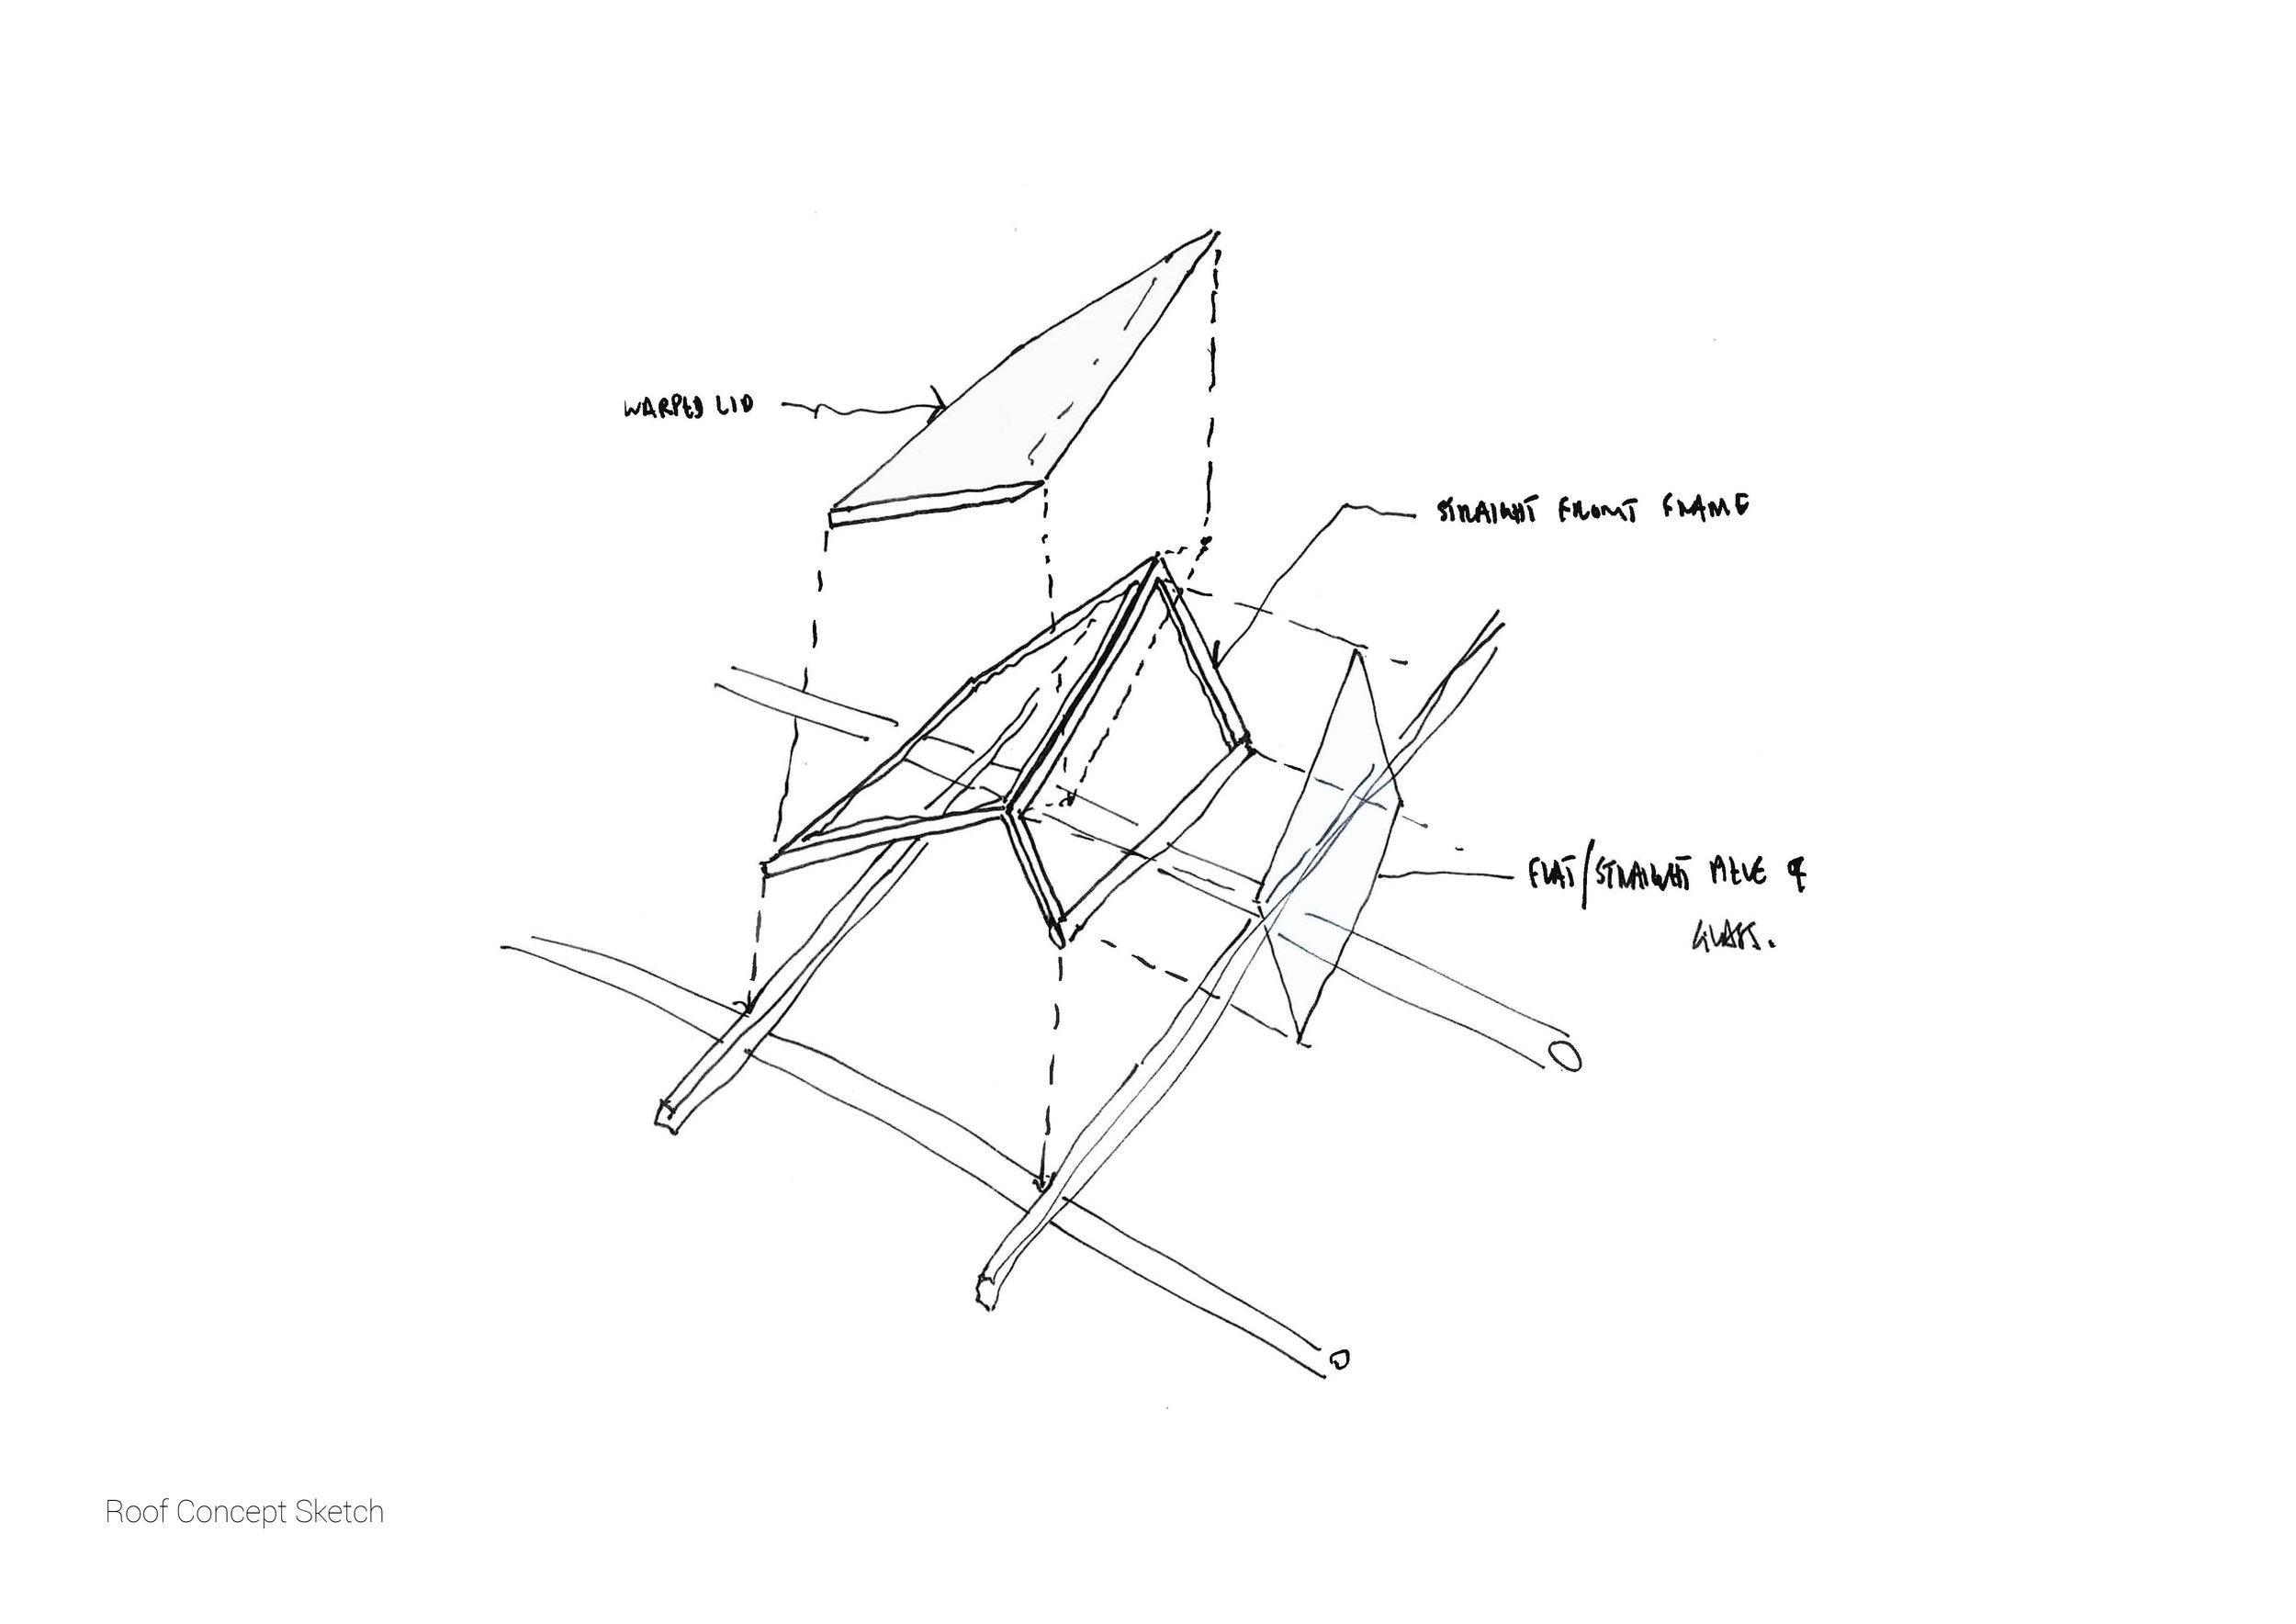 Roof Concept Sketch.jpg